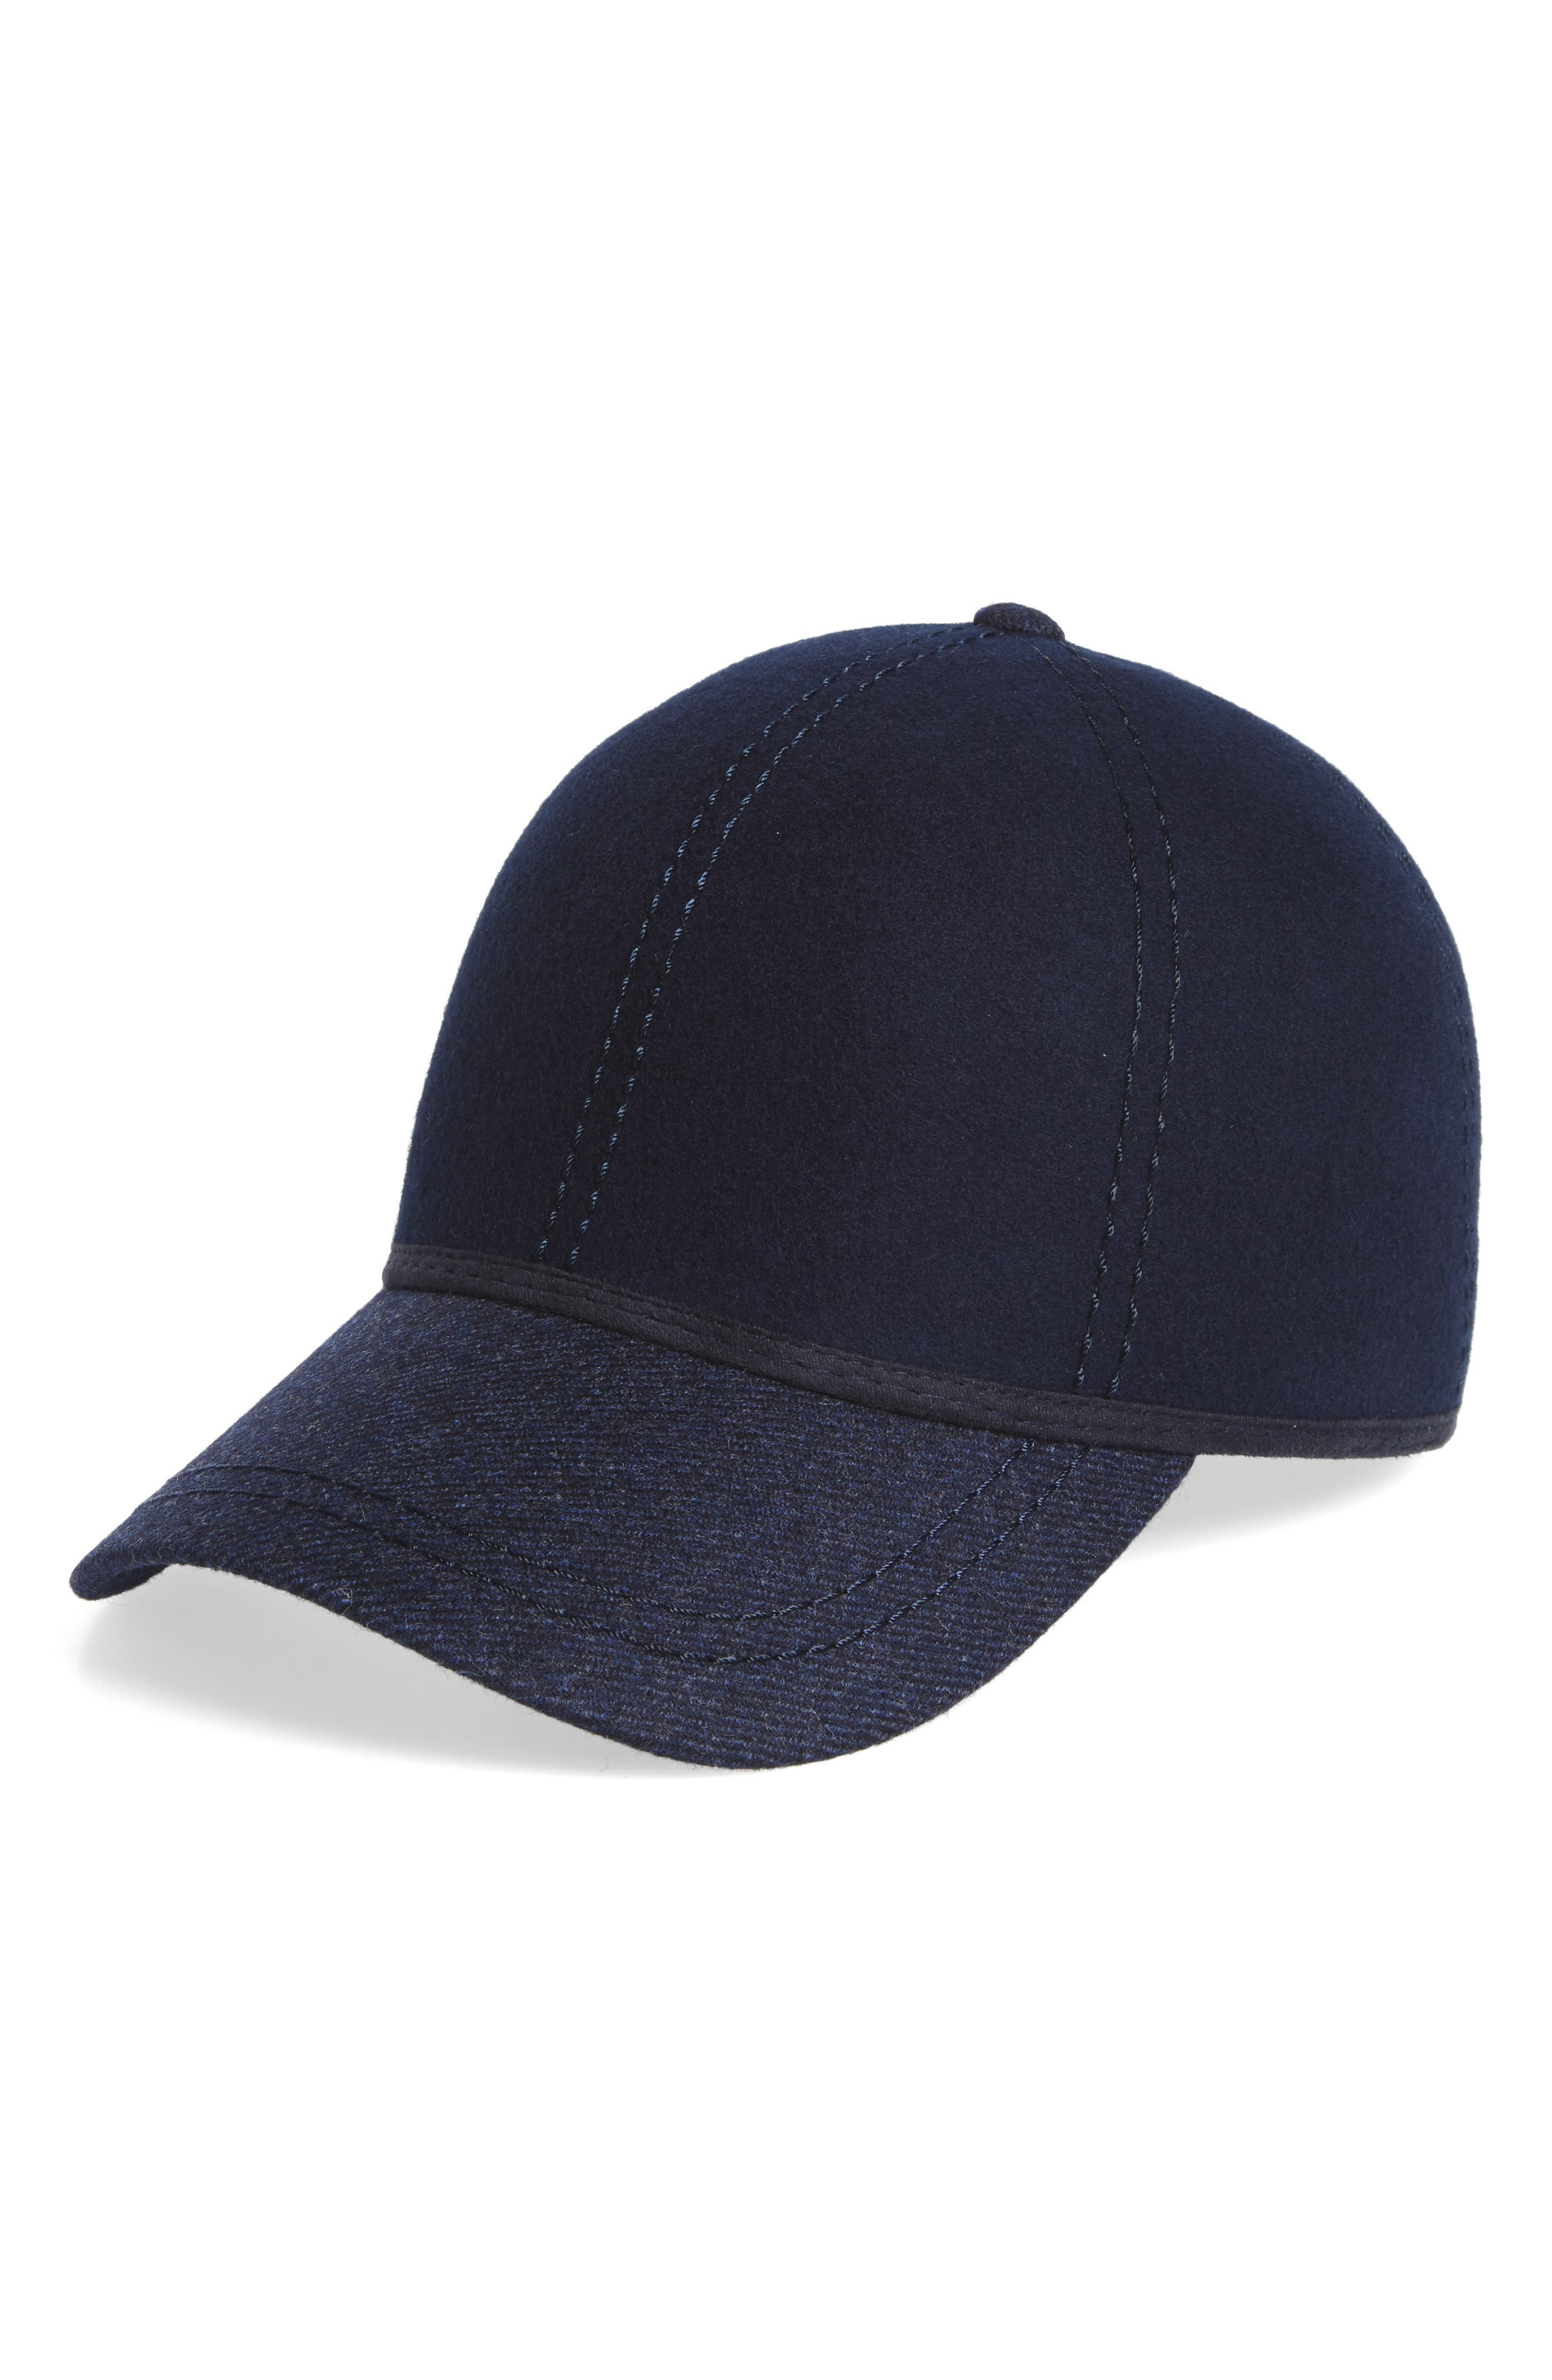 Christy's British Baseball Cap